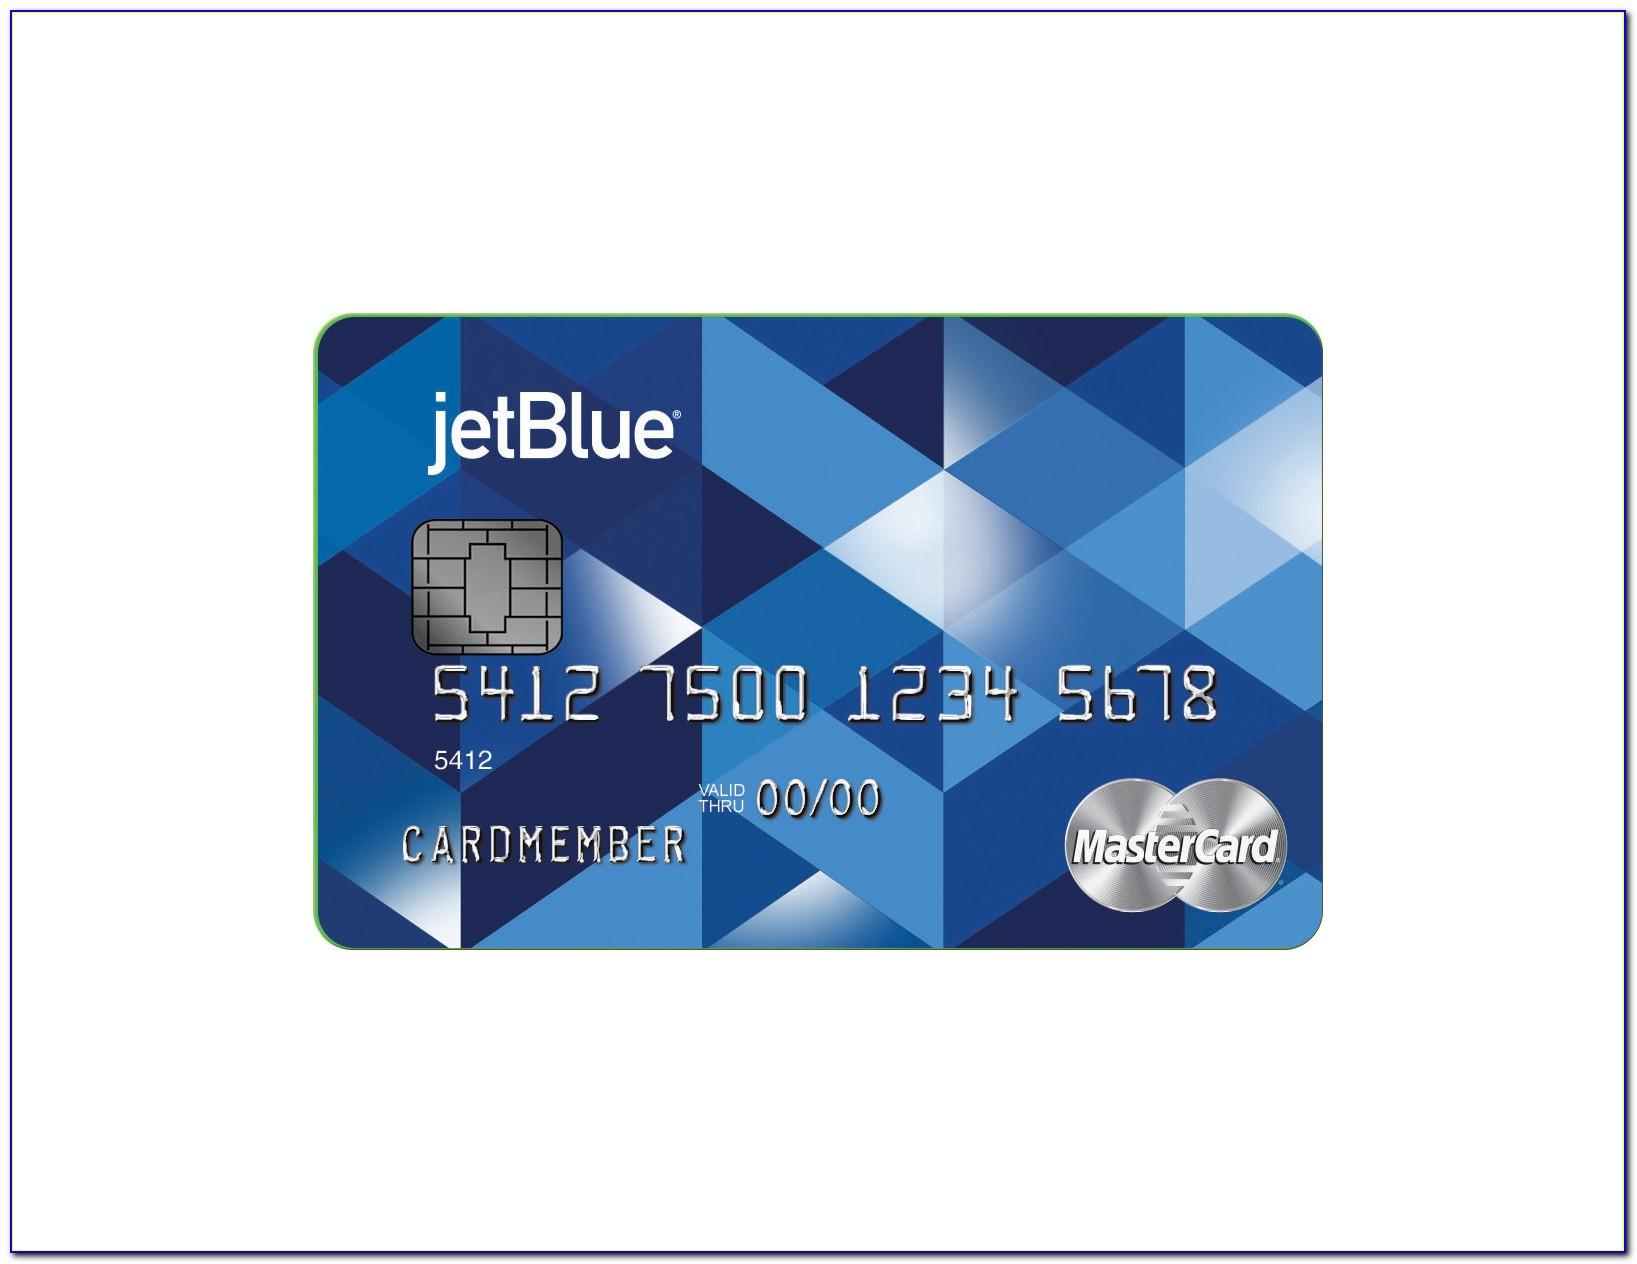 Jetblue Business Card Application